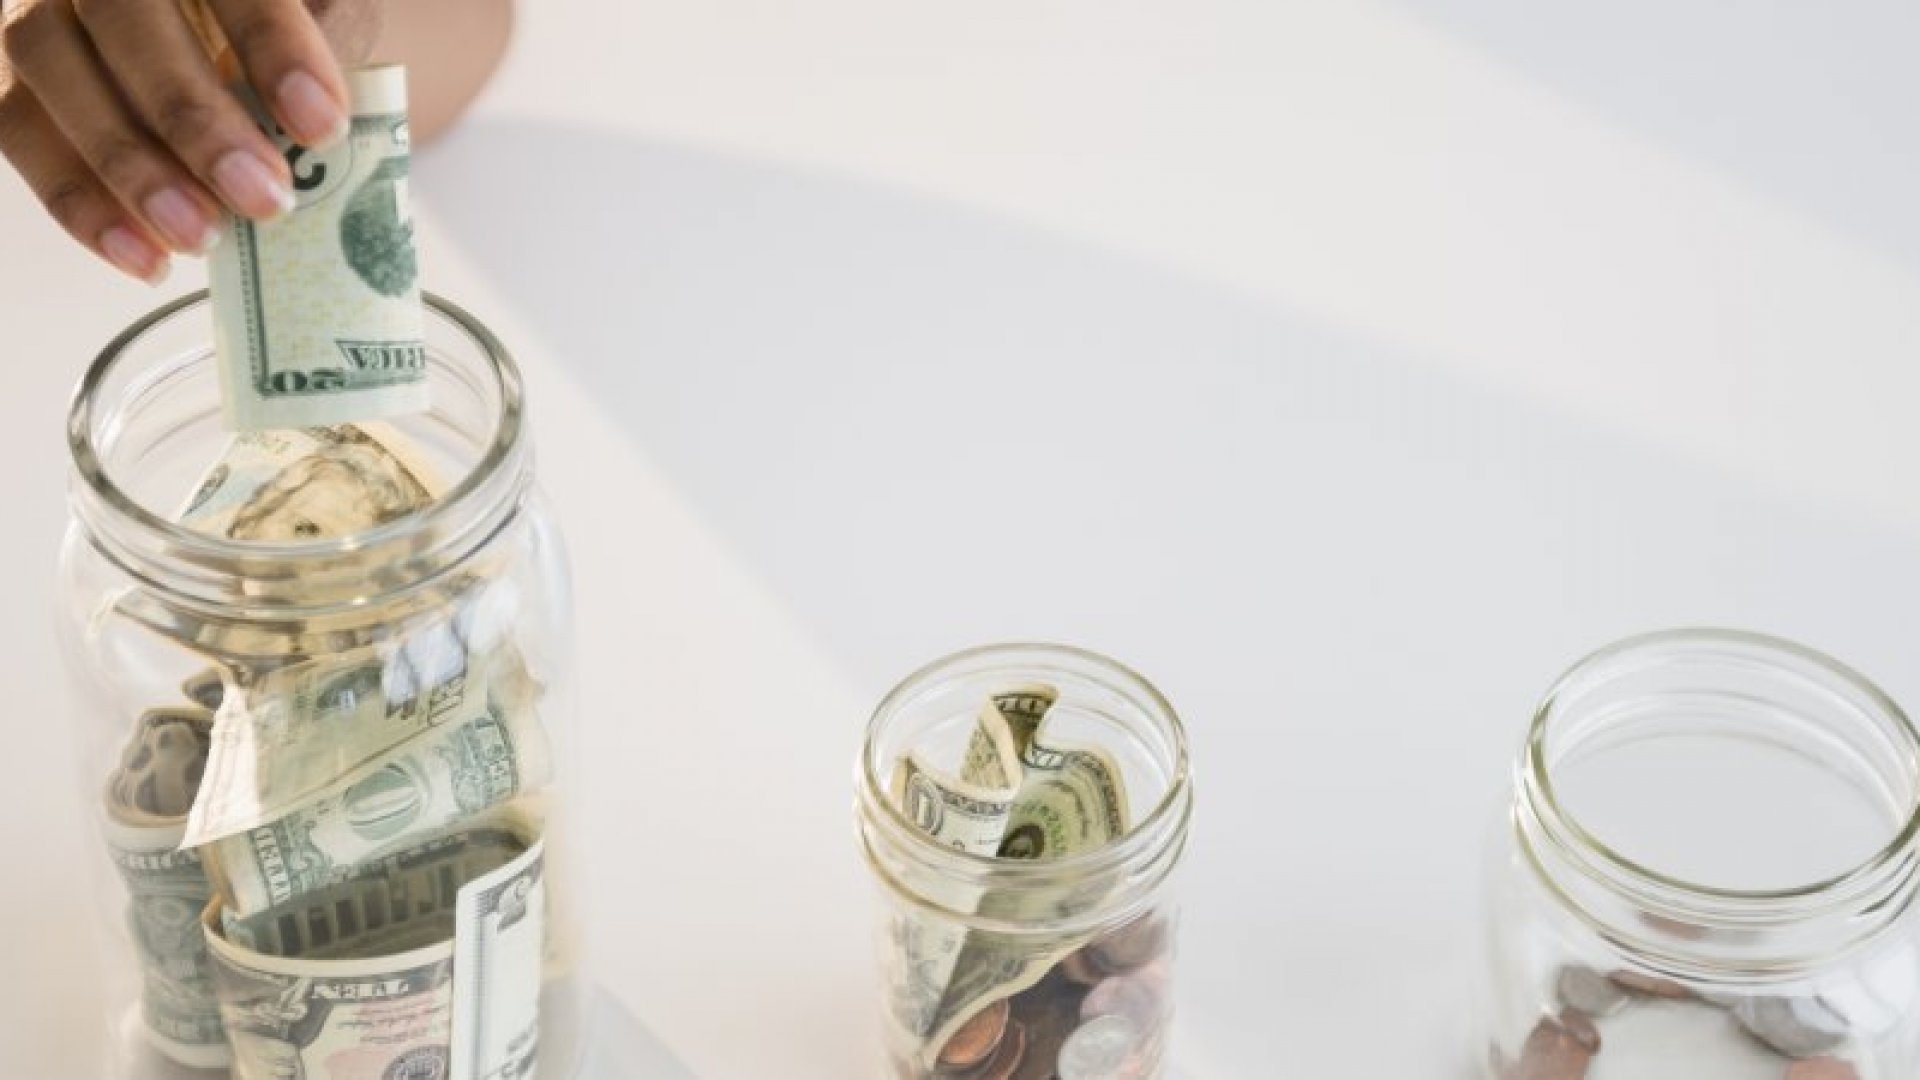 Kickstarter's 'Staff Picks': The Holy Grail of Crowdfunding